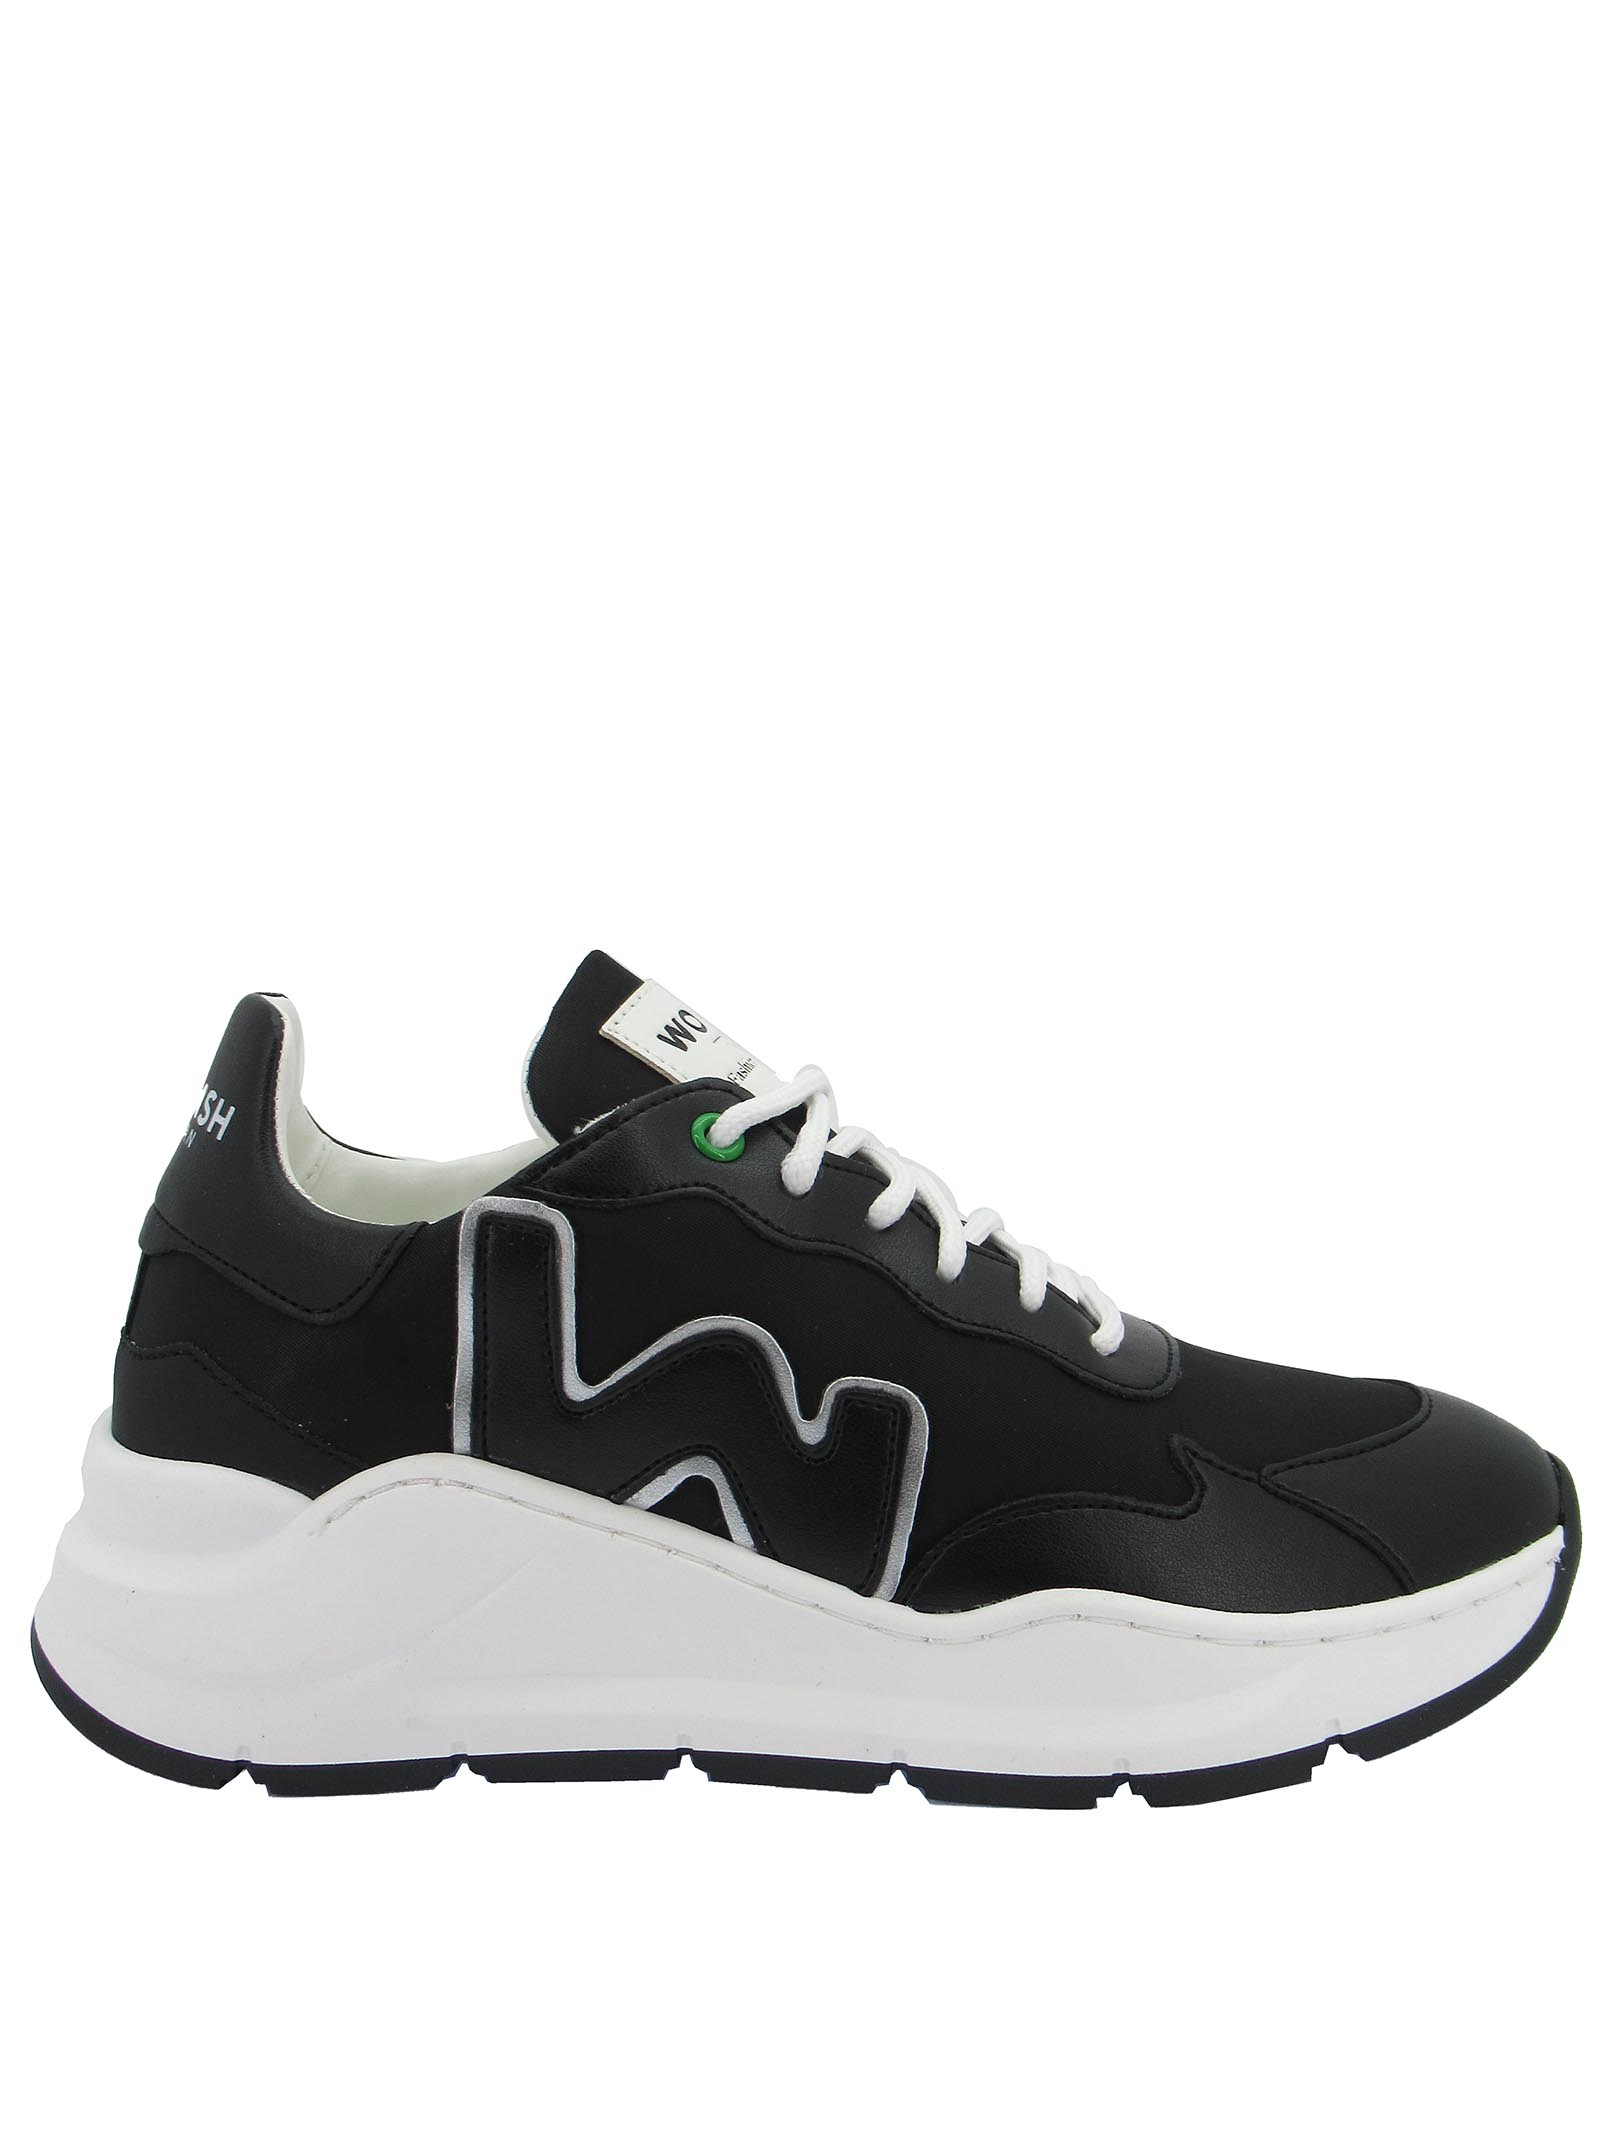 Calzature Donna Sneakers Stringate Vegan Wave in Nylon Nero Fondo Zeppa in Gomma Bianca Womsh   Sneakers   VEGAN WAVEWA005